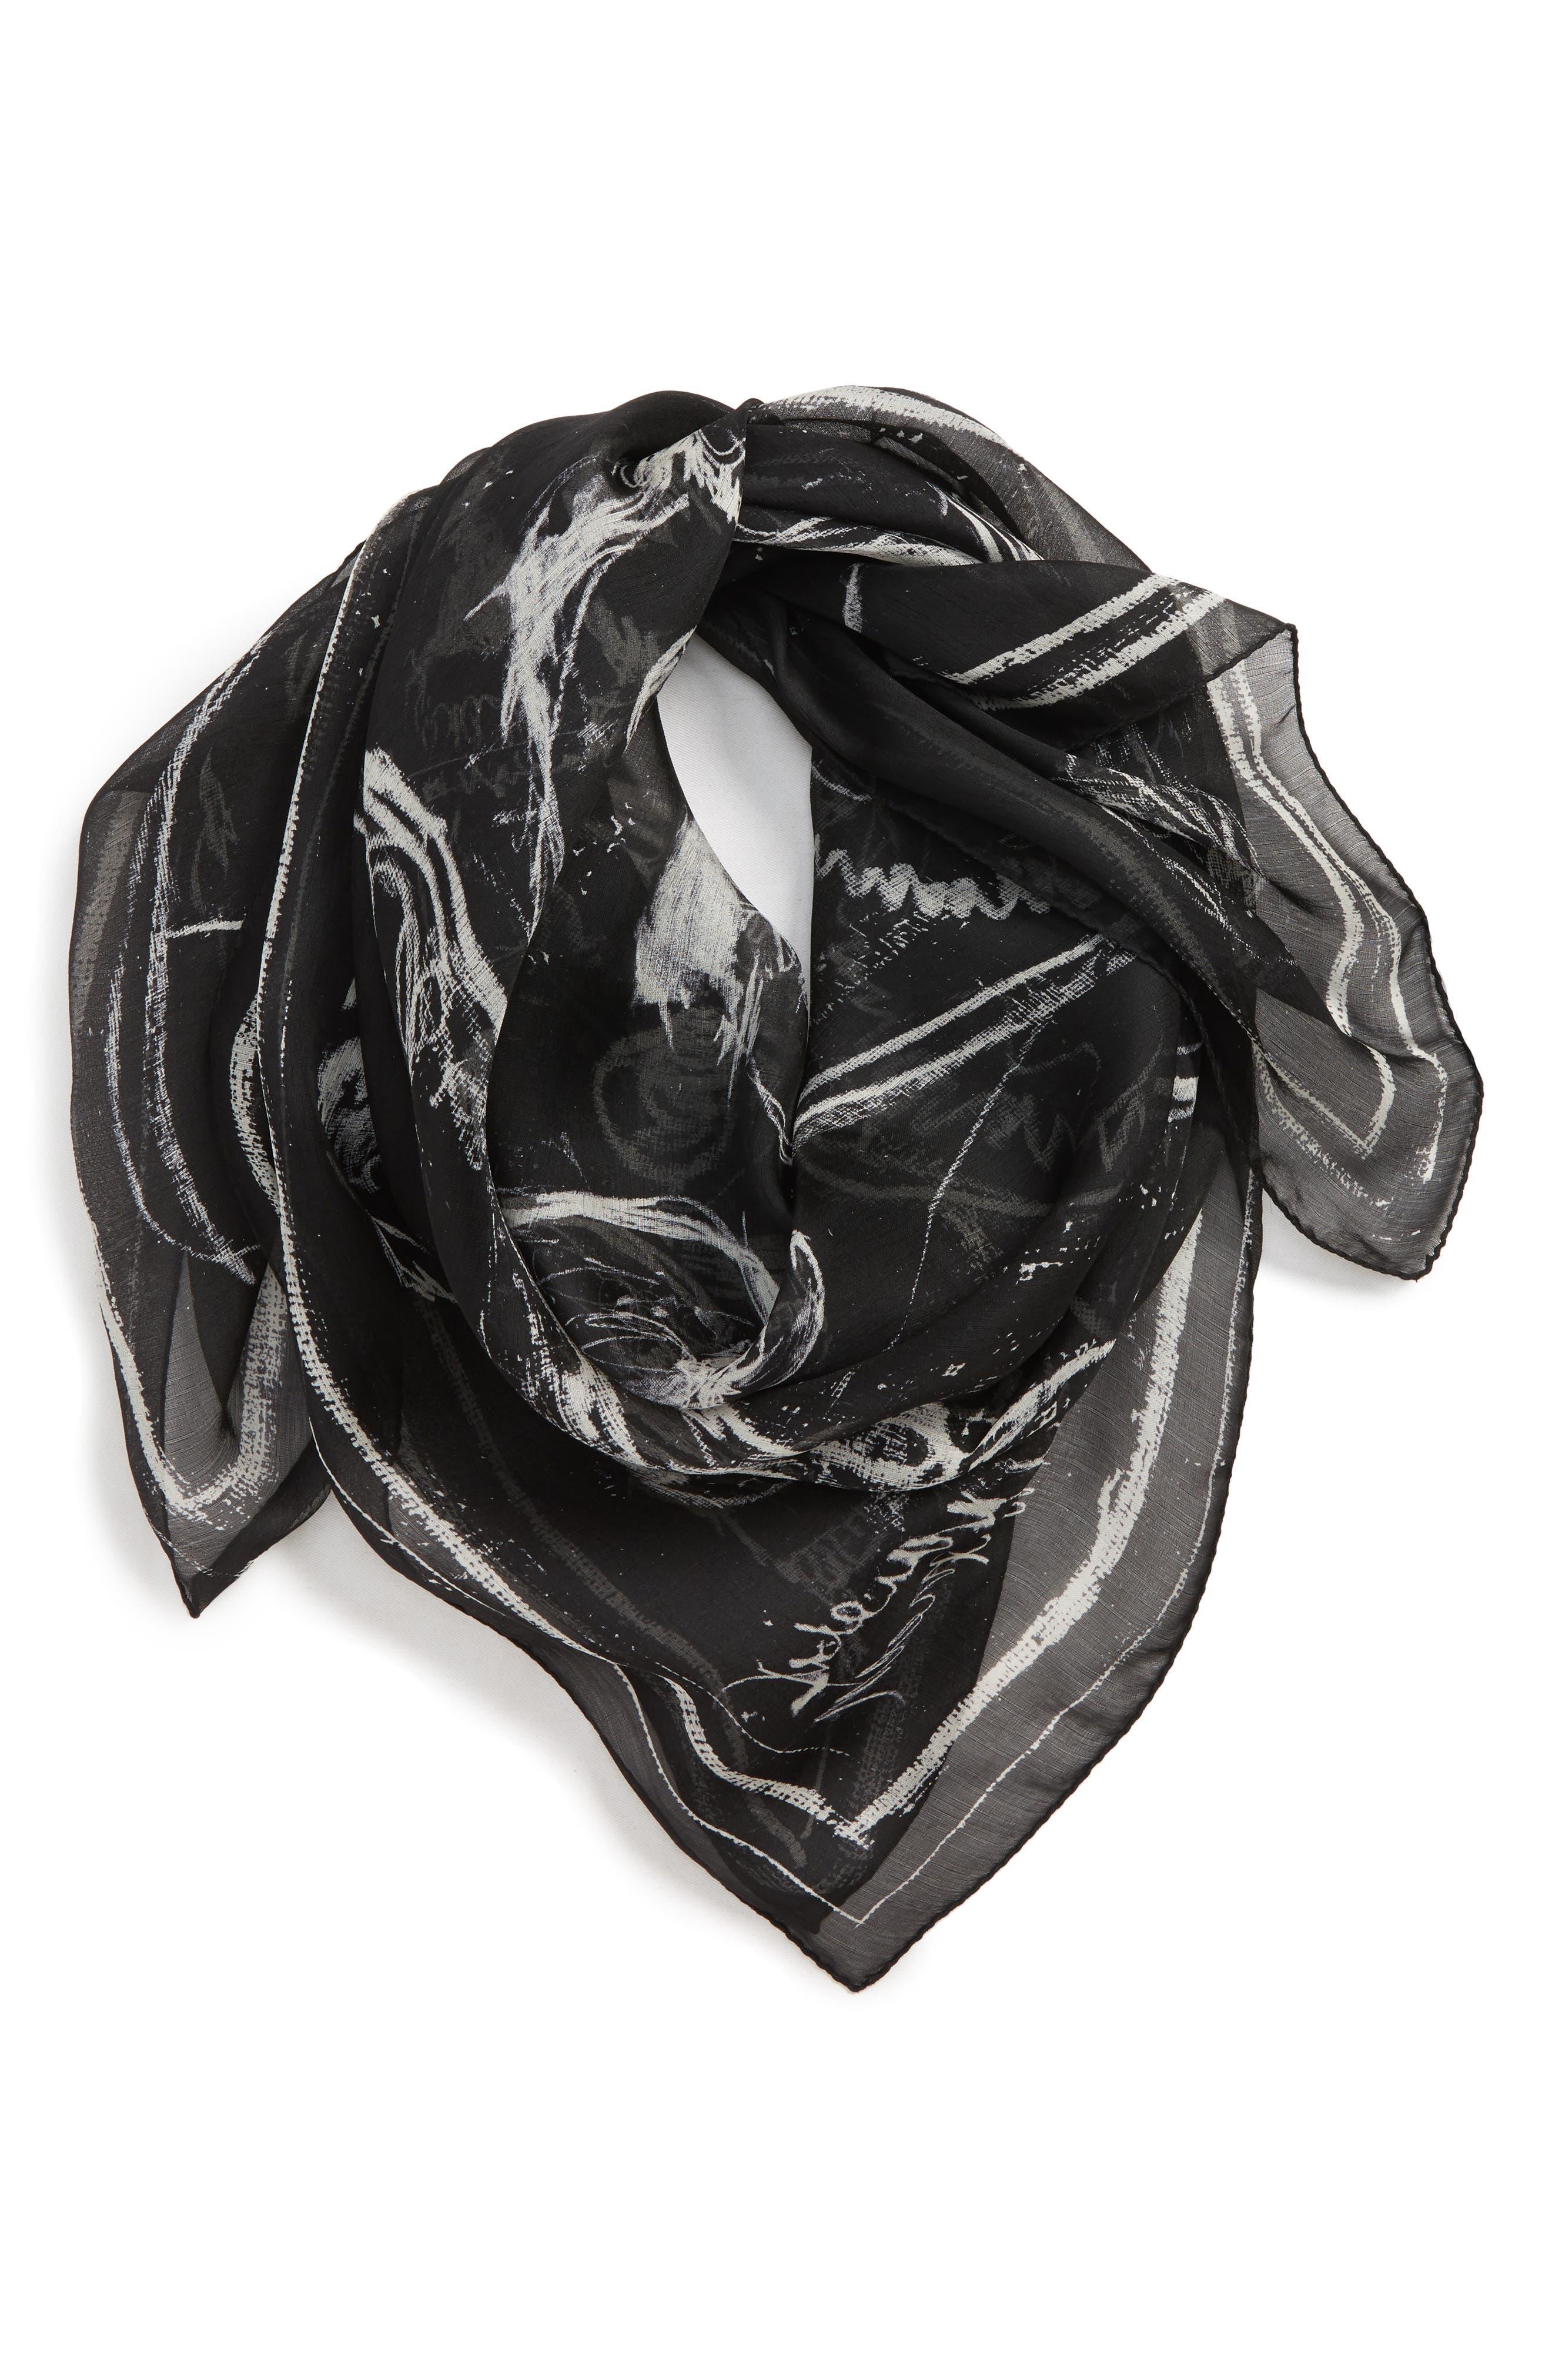 Graffiti Skull Silk Scarf,                             Main thumbnail 1, color,                             BLACK/ IVORY